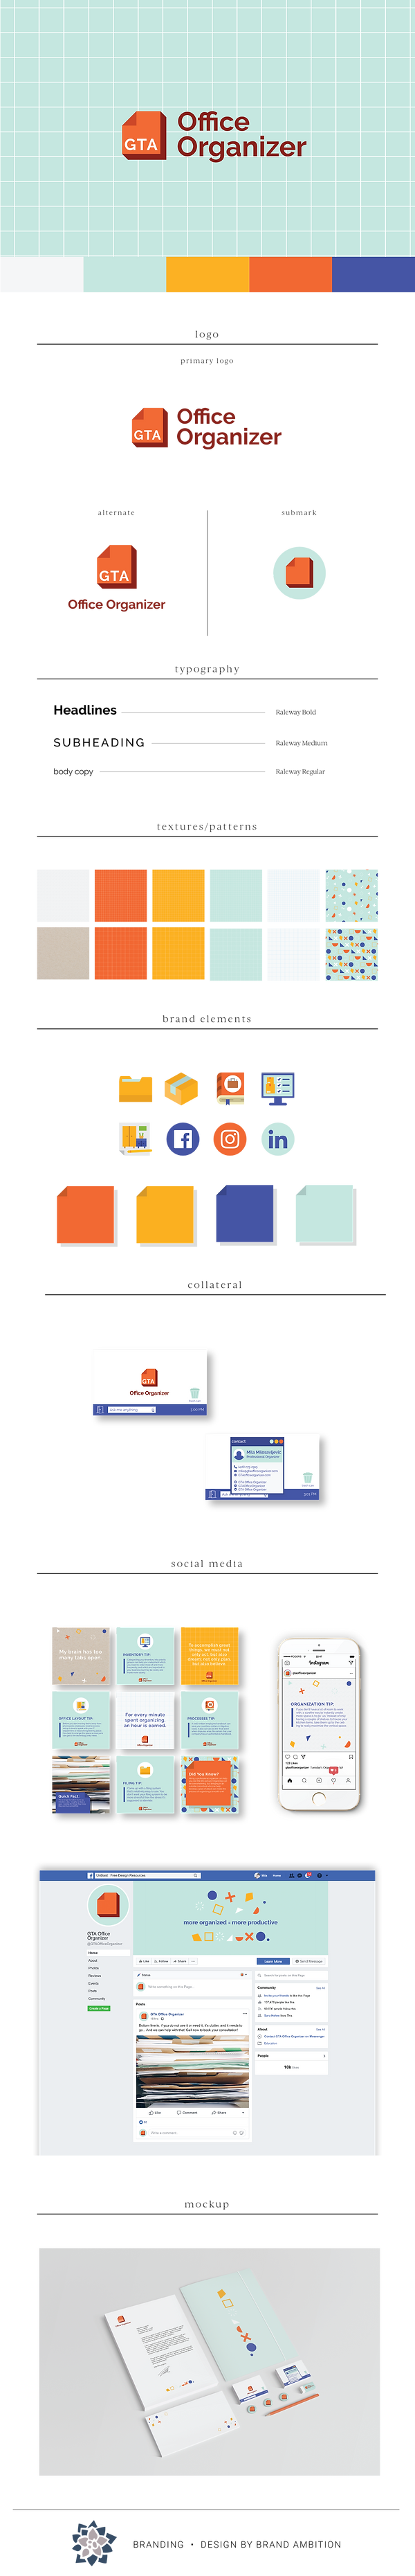 GTA Office Organizer_BrandBoard_2020-01.